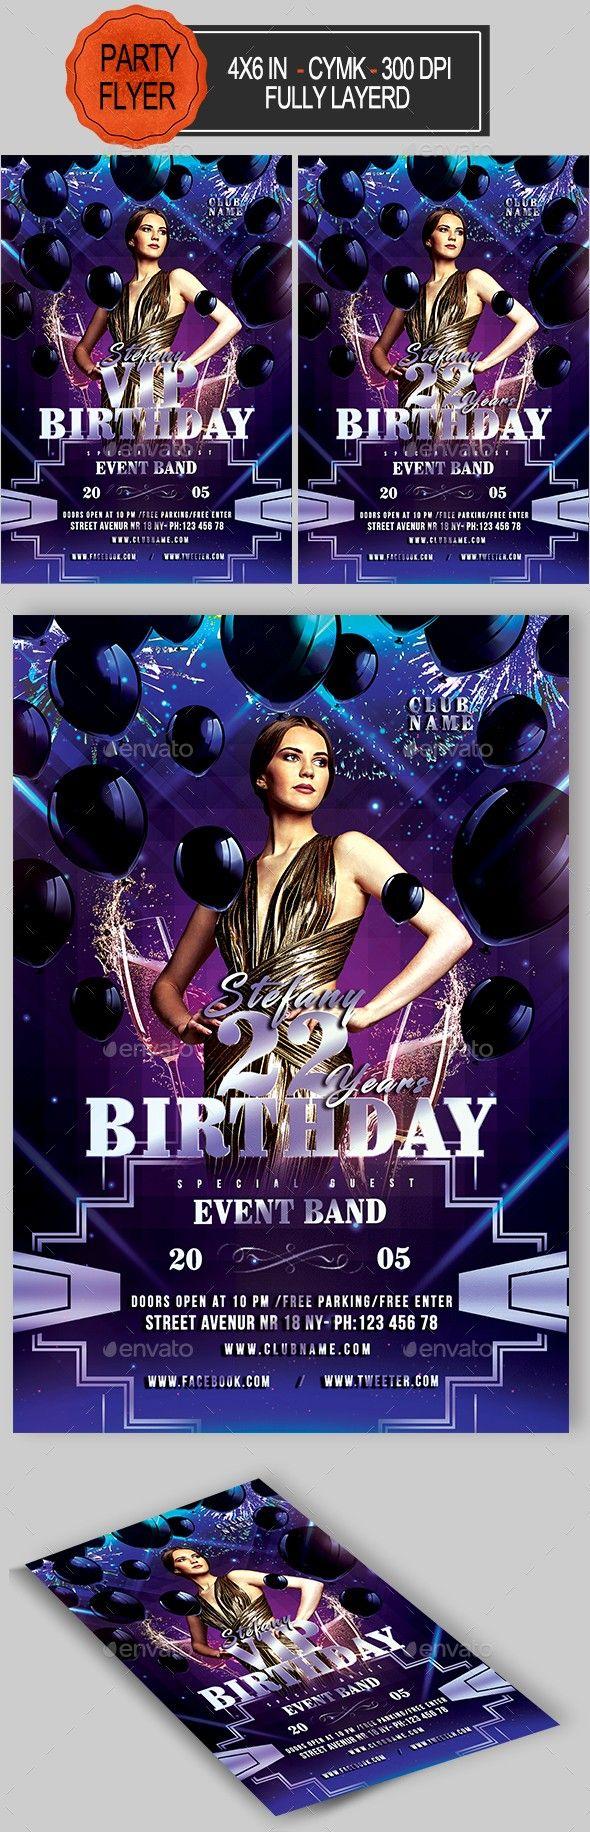 ANATOMY Nightclub + Ultralounge - Cleveland, OH, United States. Our ...